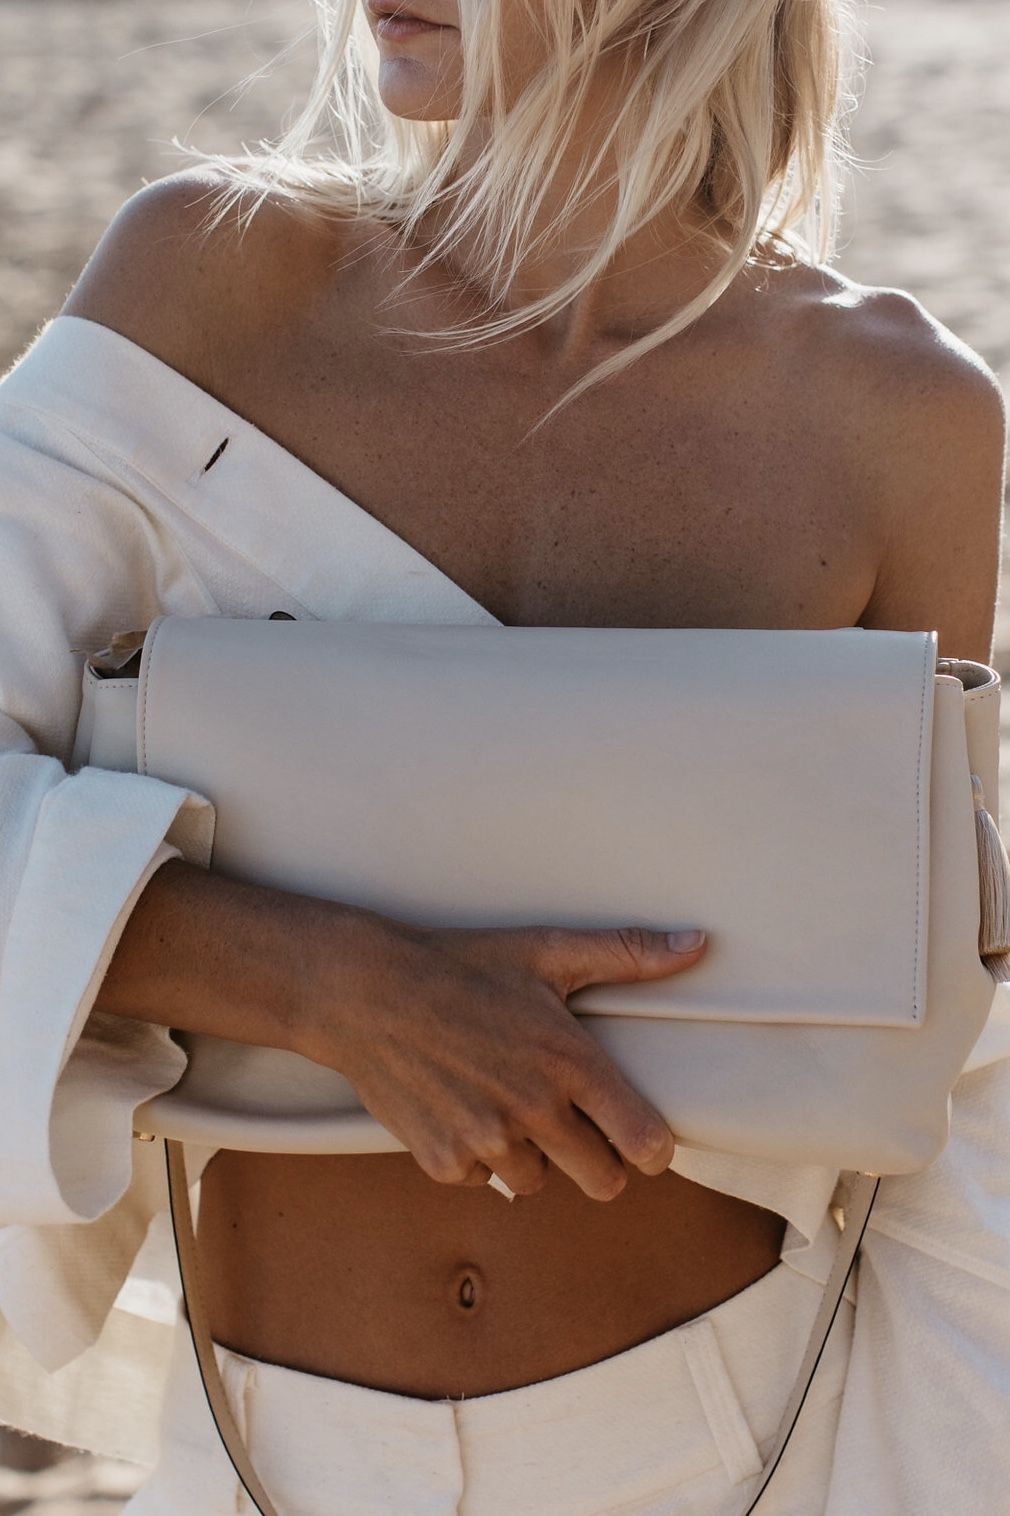 KEEVIL Flap Bag. Flap bag, Photography business, Fashion